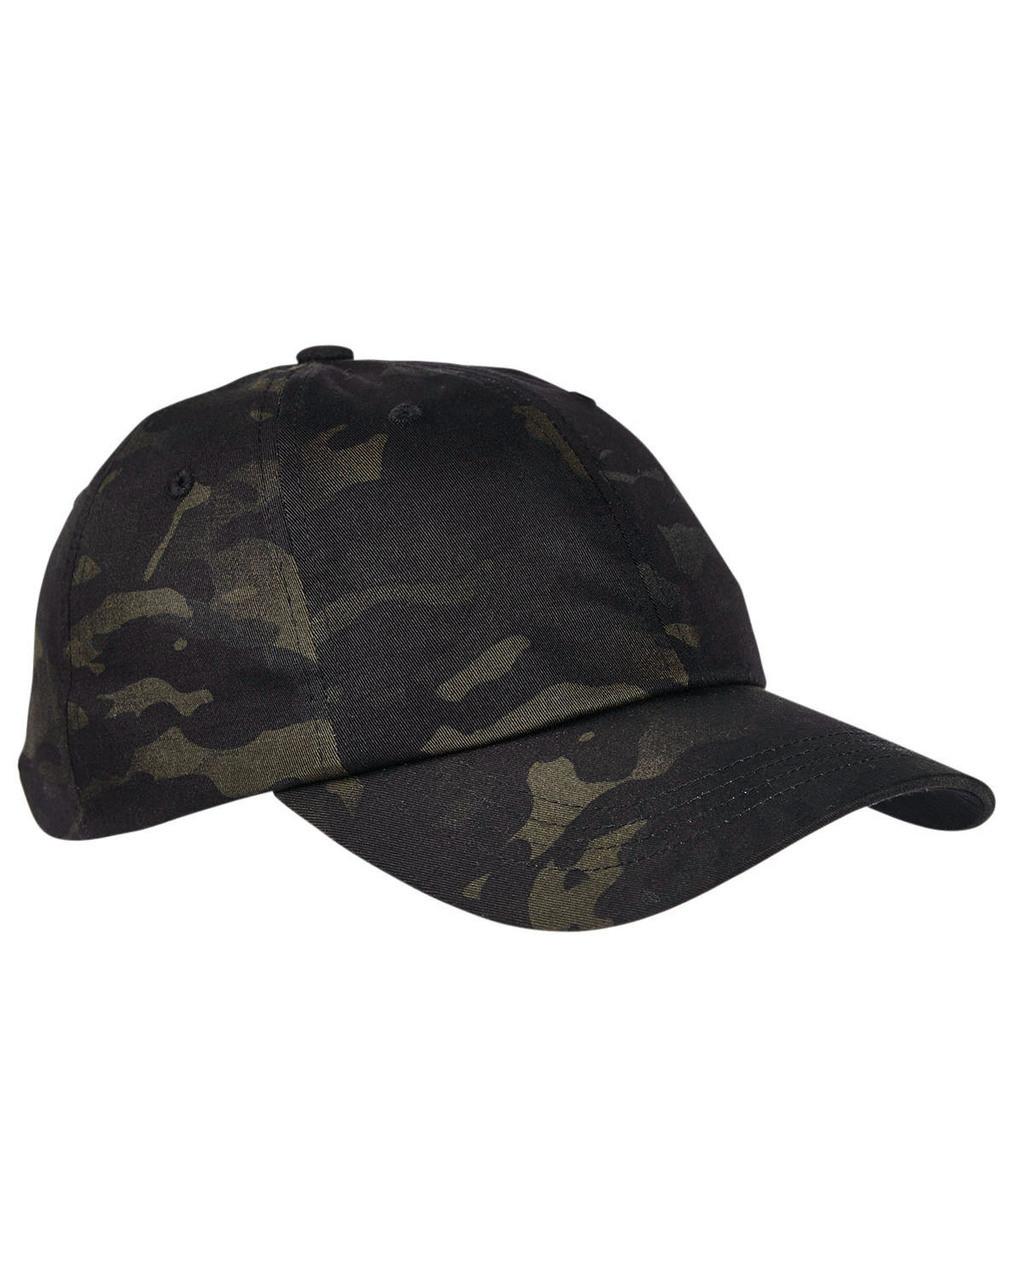 0ecfd617a Yupoong 6245MC Low Profile Cotton Twill Multicam® Cap ...